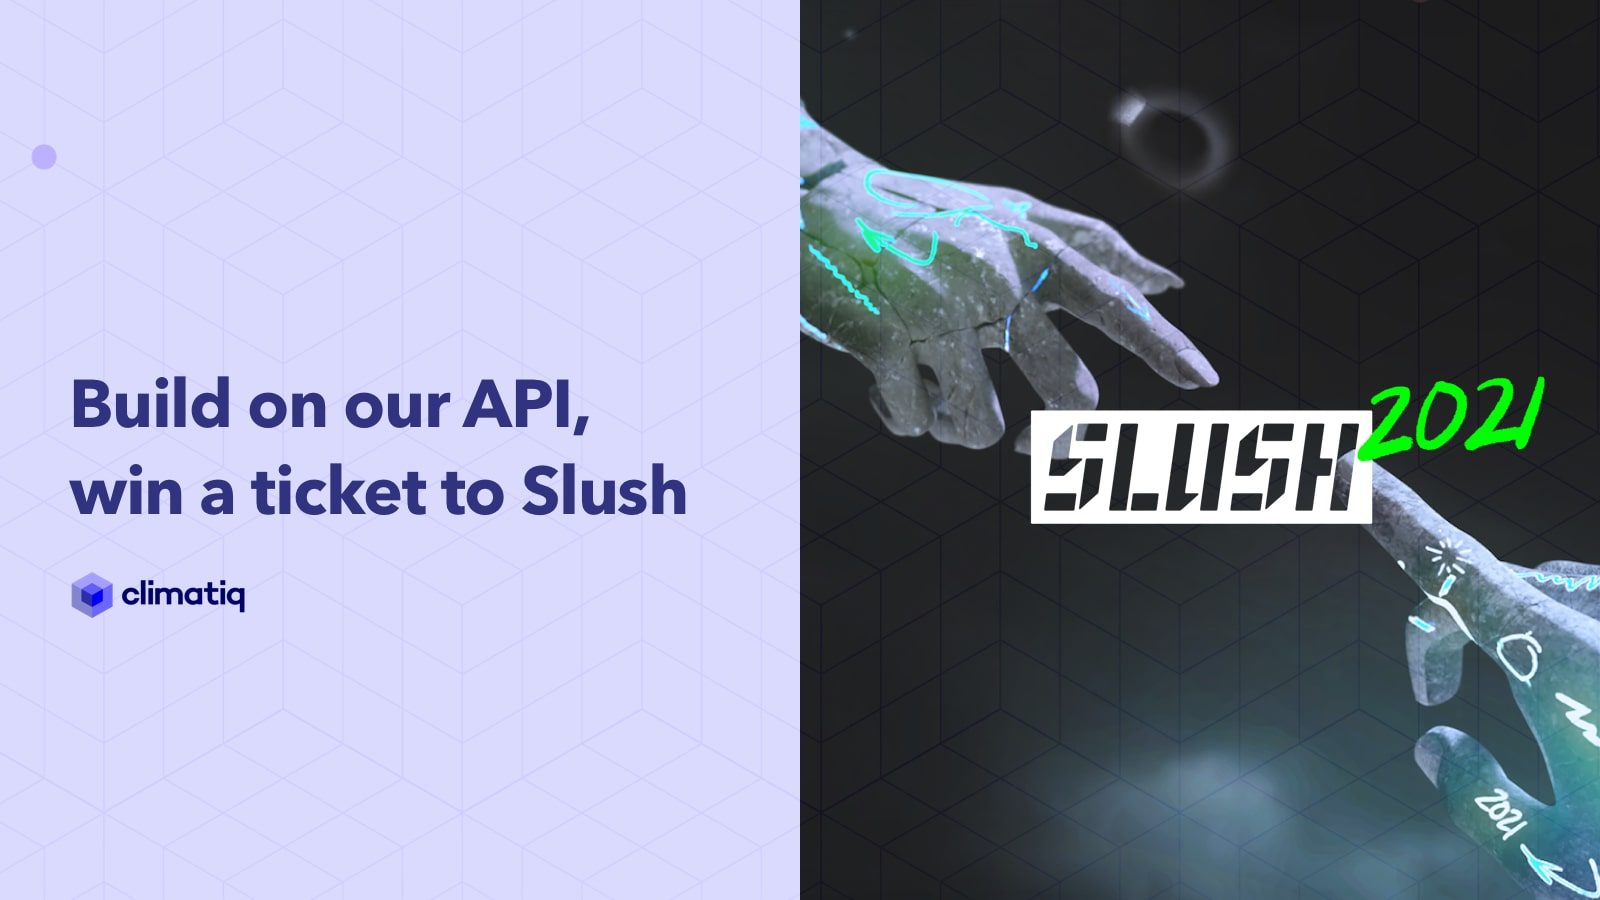 Build on our API, Win a Ticket to Slush